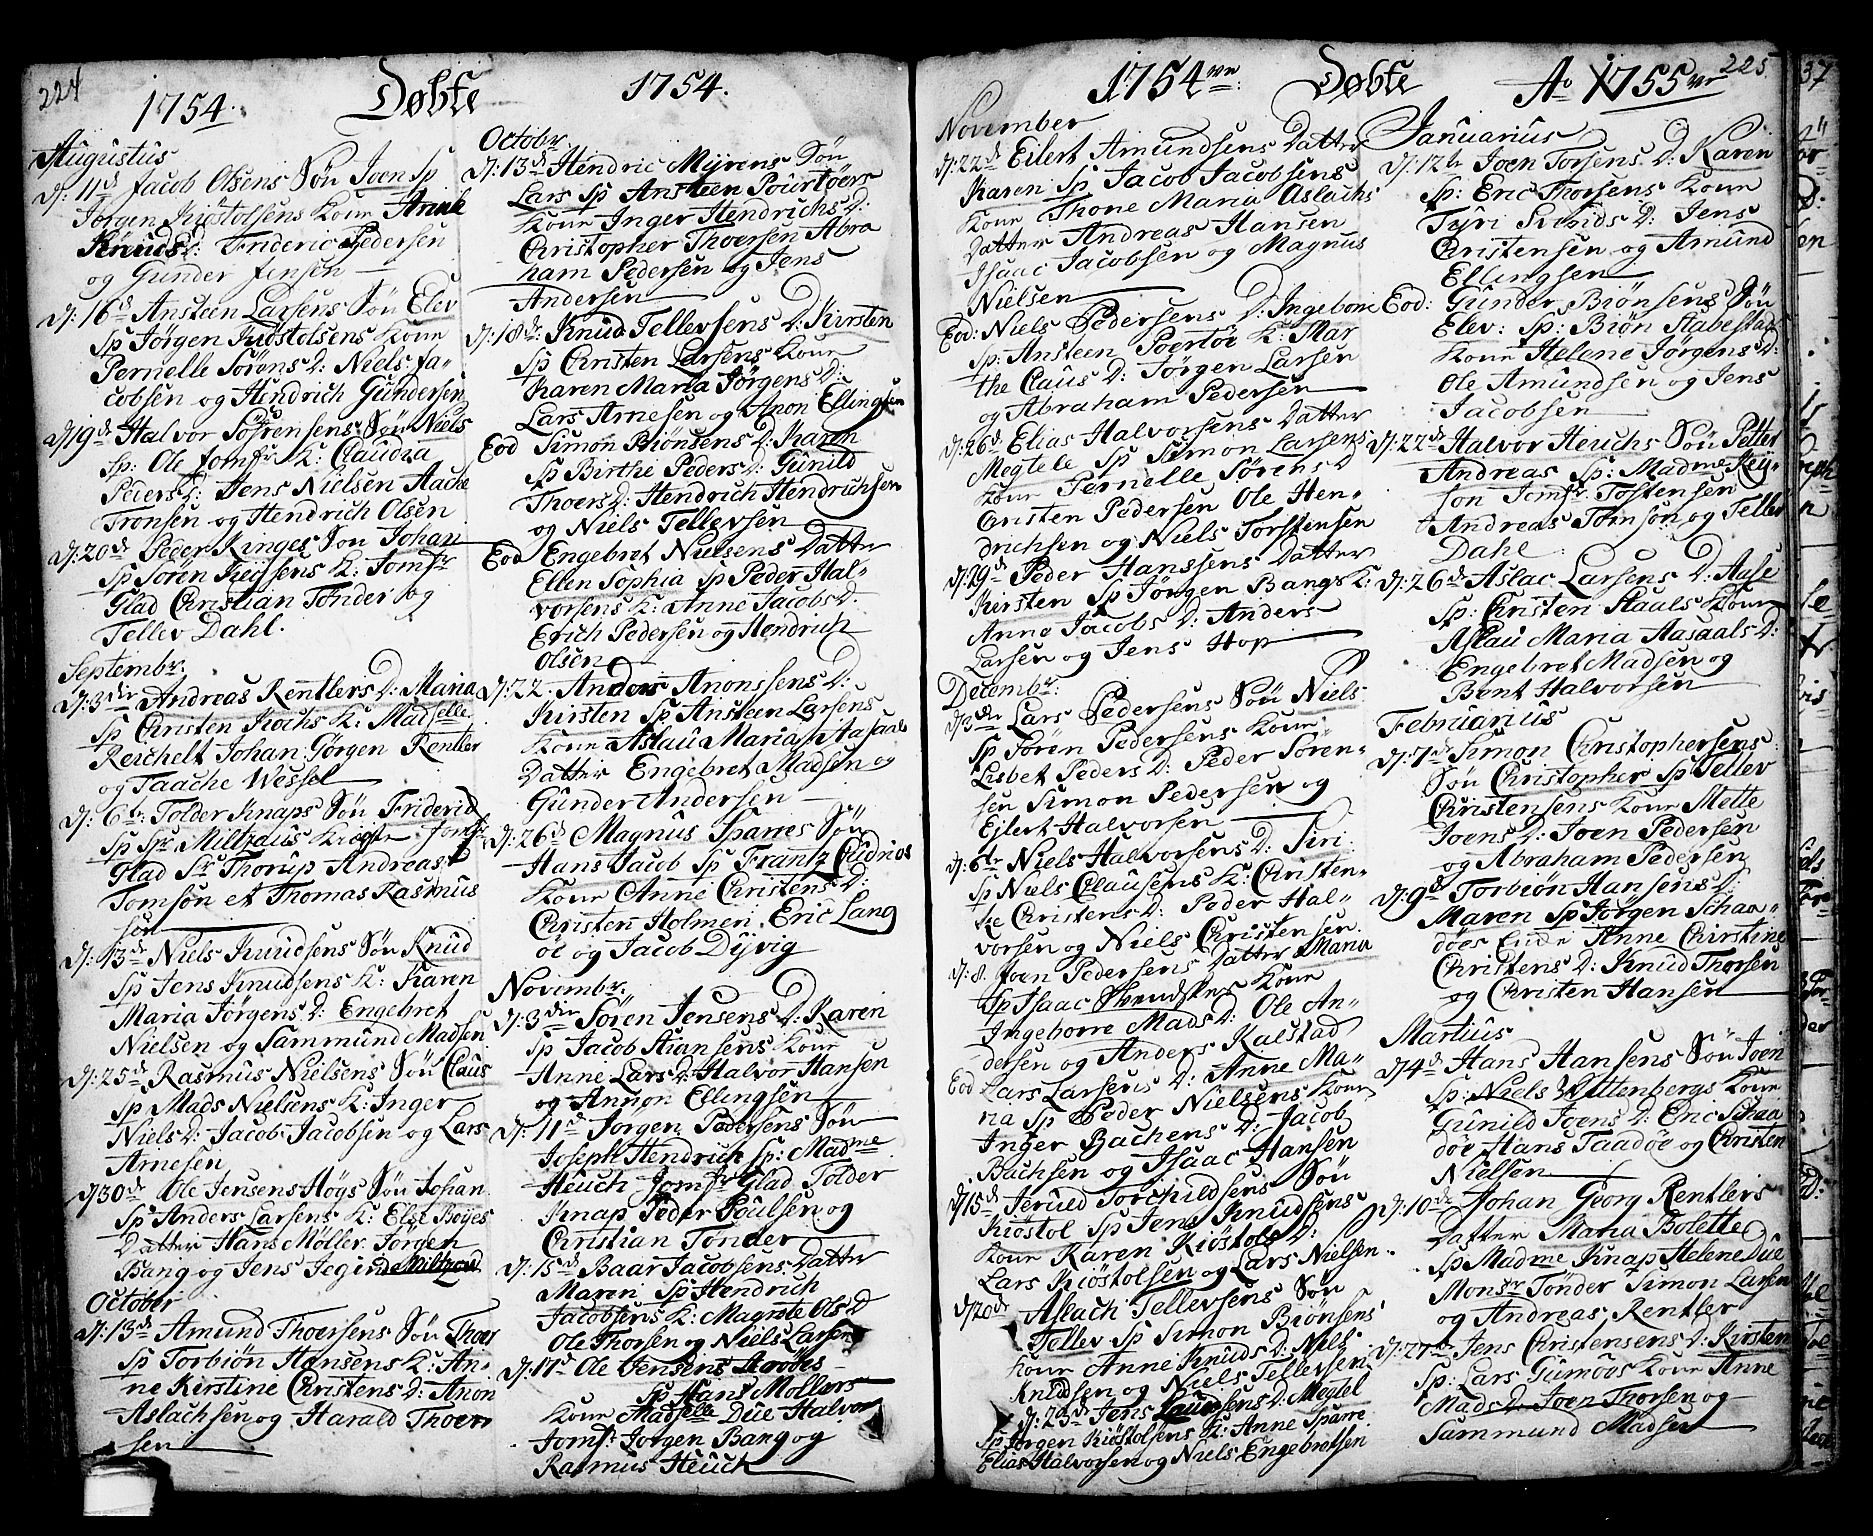 SAKO, Kragerø kirkebøker, F/Fa/L0001: Ministerialbok nr. 1, 1702-1766, s. 224-225